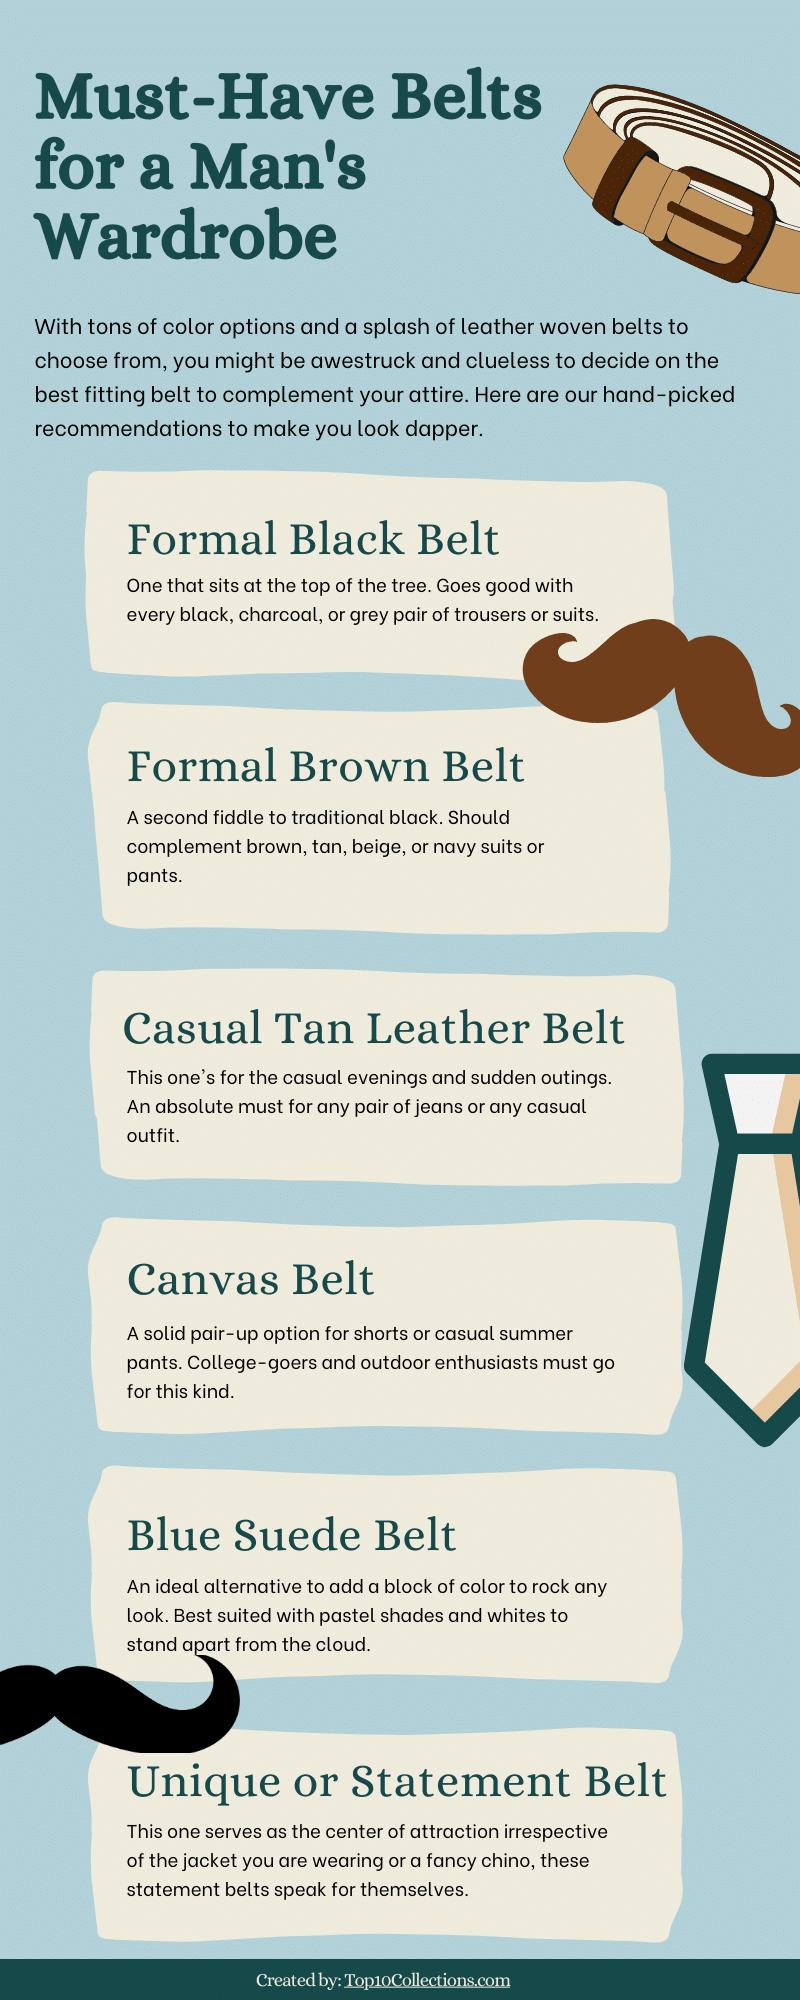 belt brands infographic